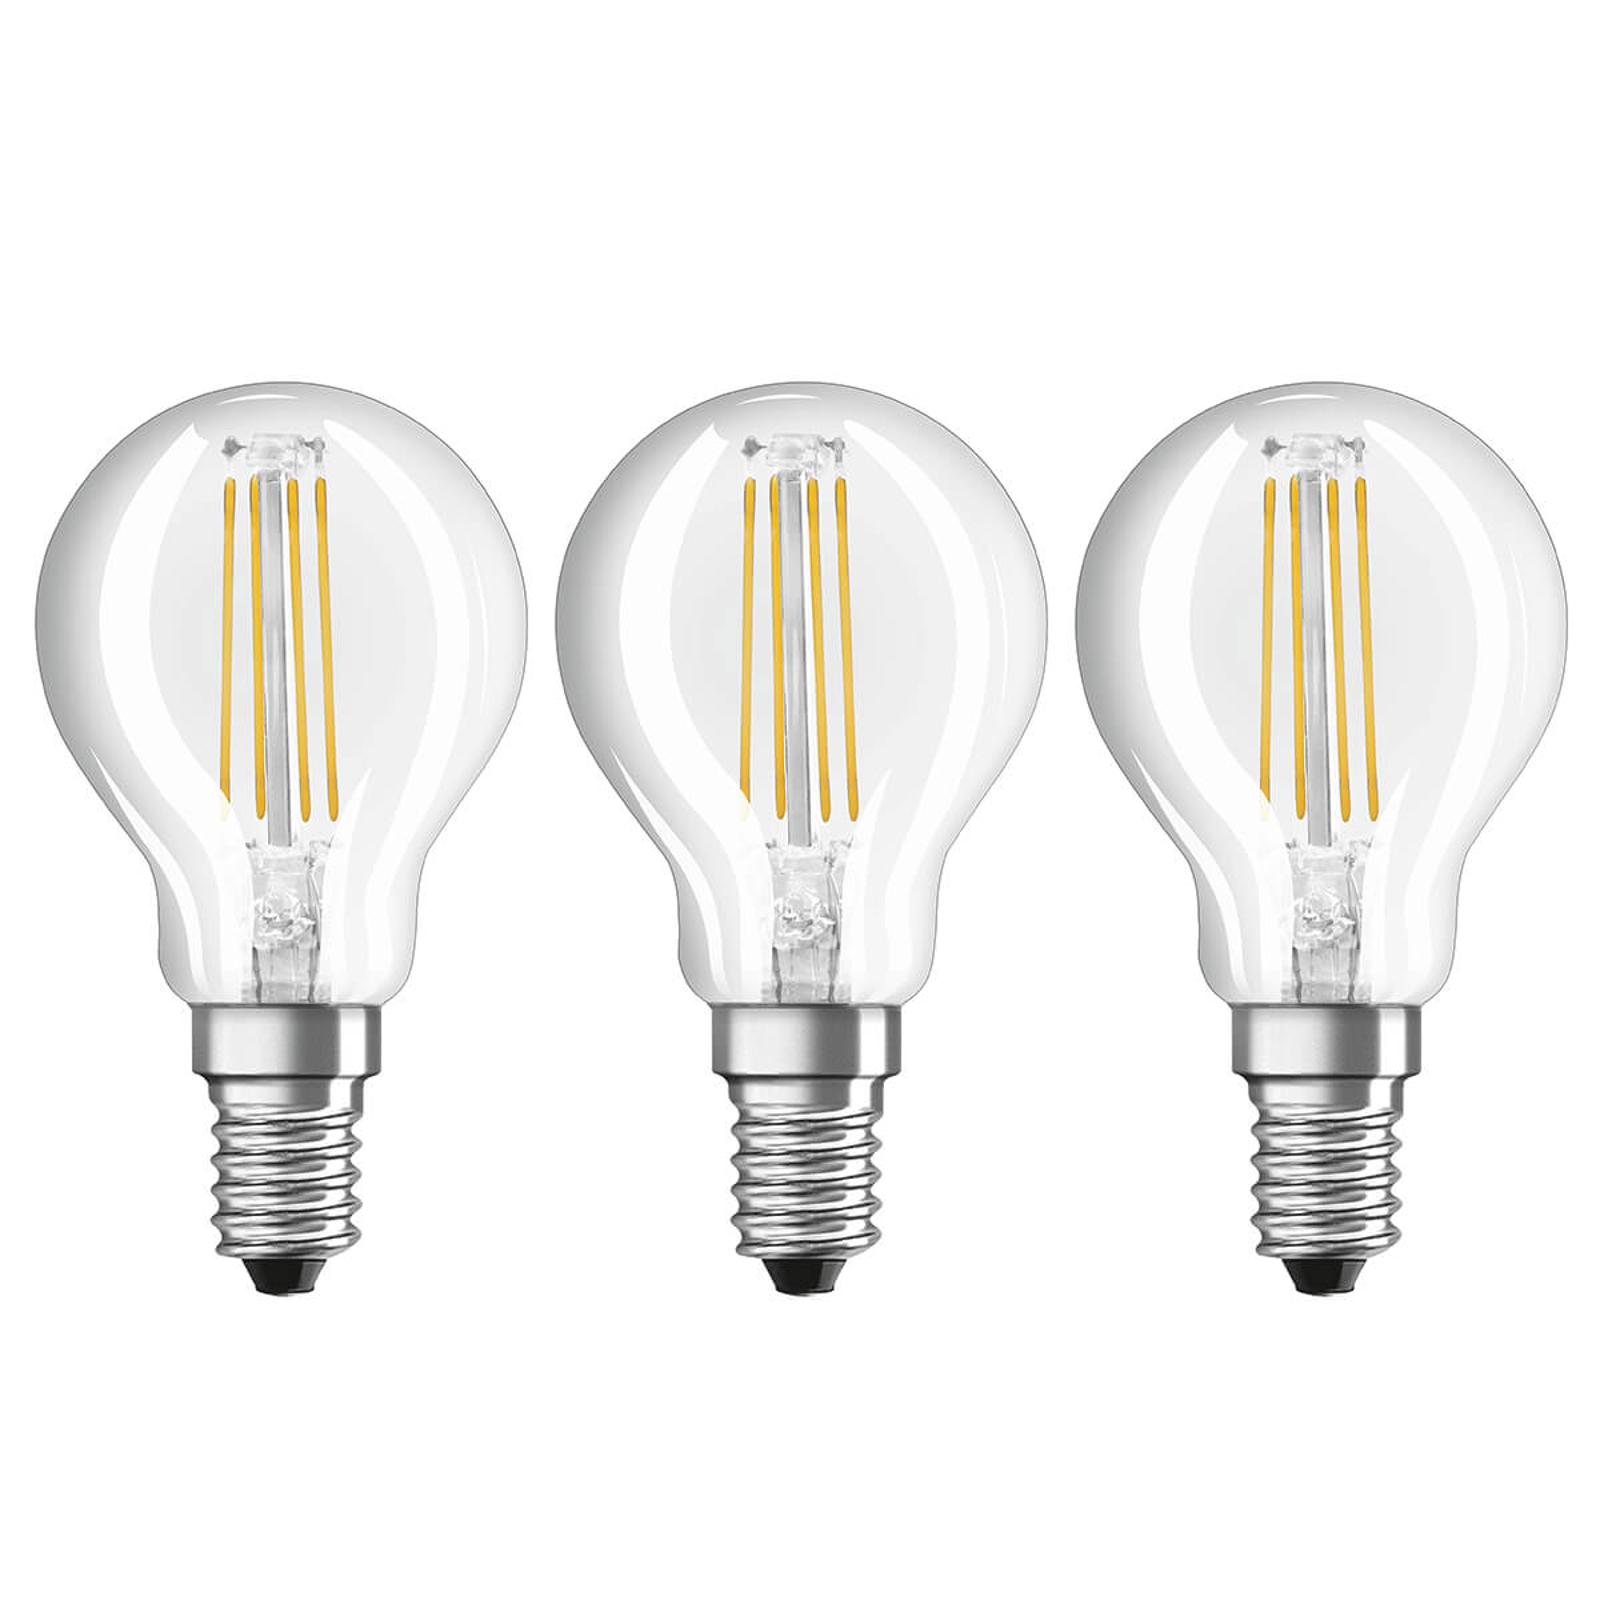 LED gloeilamp E14 4 W, warmwit, set van 3